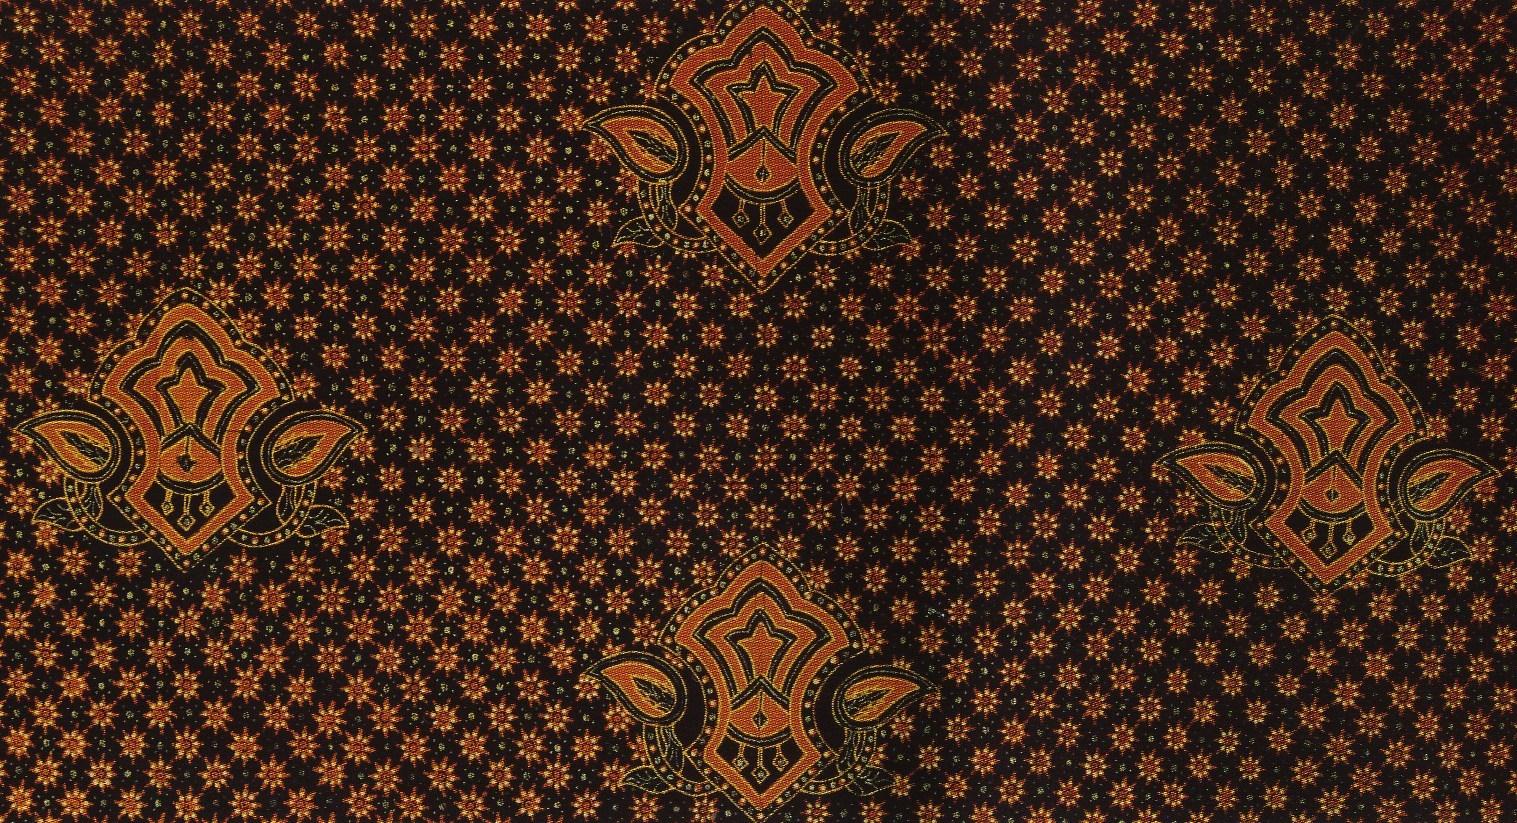 Sejarah Batik truntum